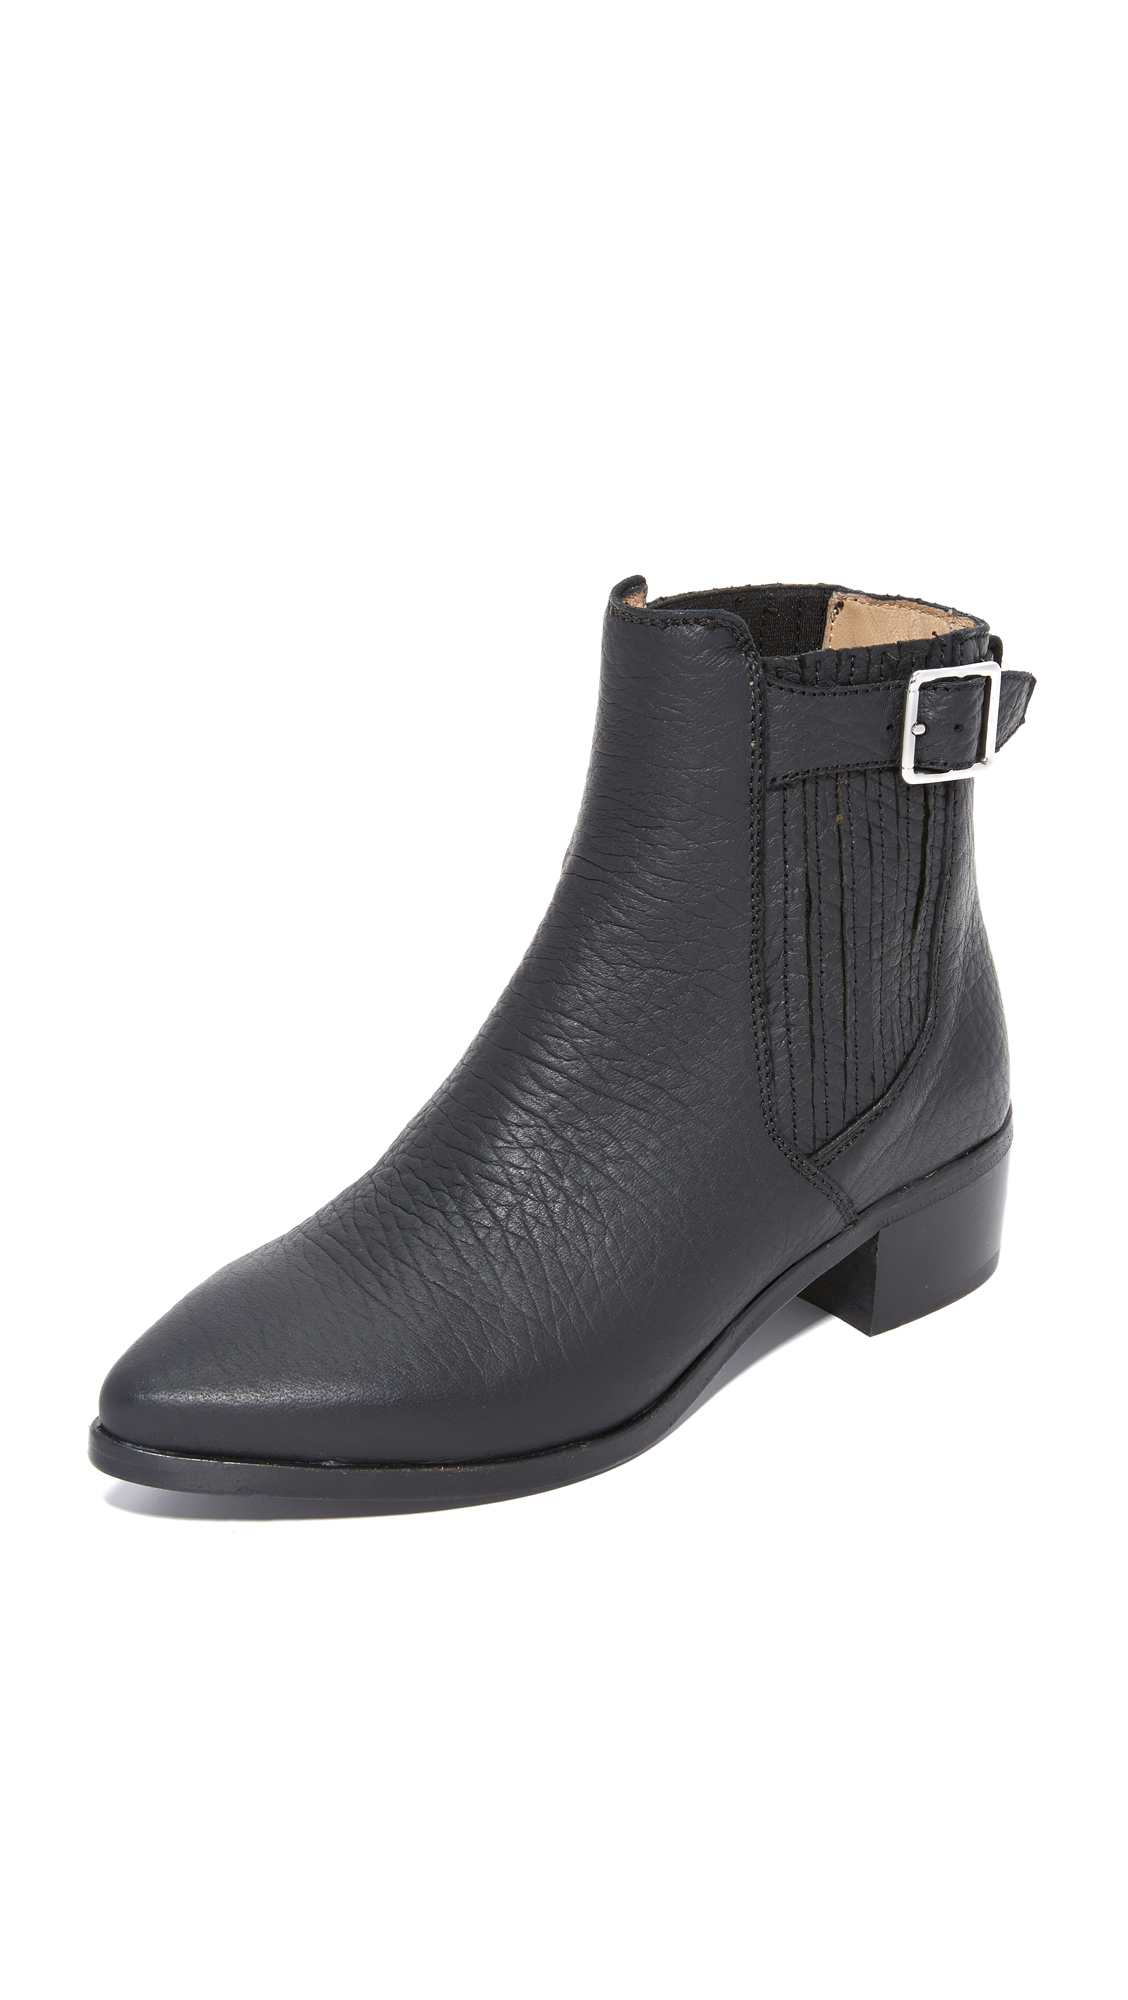 Belstaff Albaz Ankle Boots - Black at Shopbop